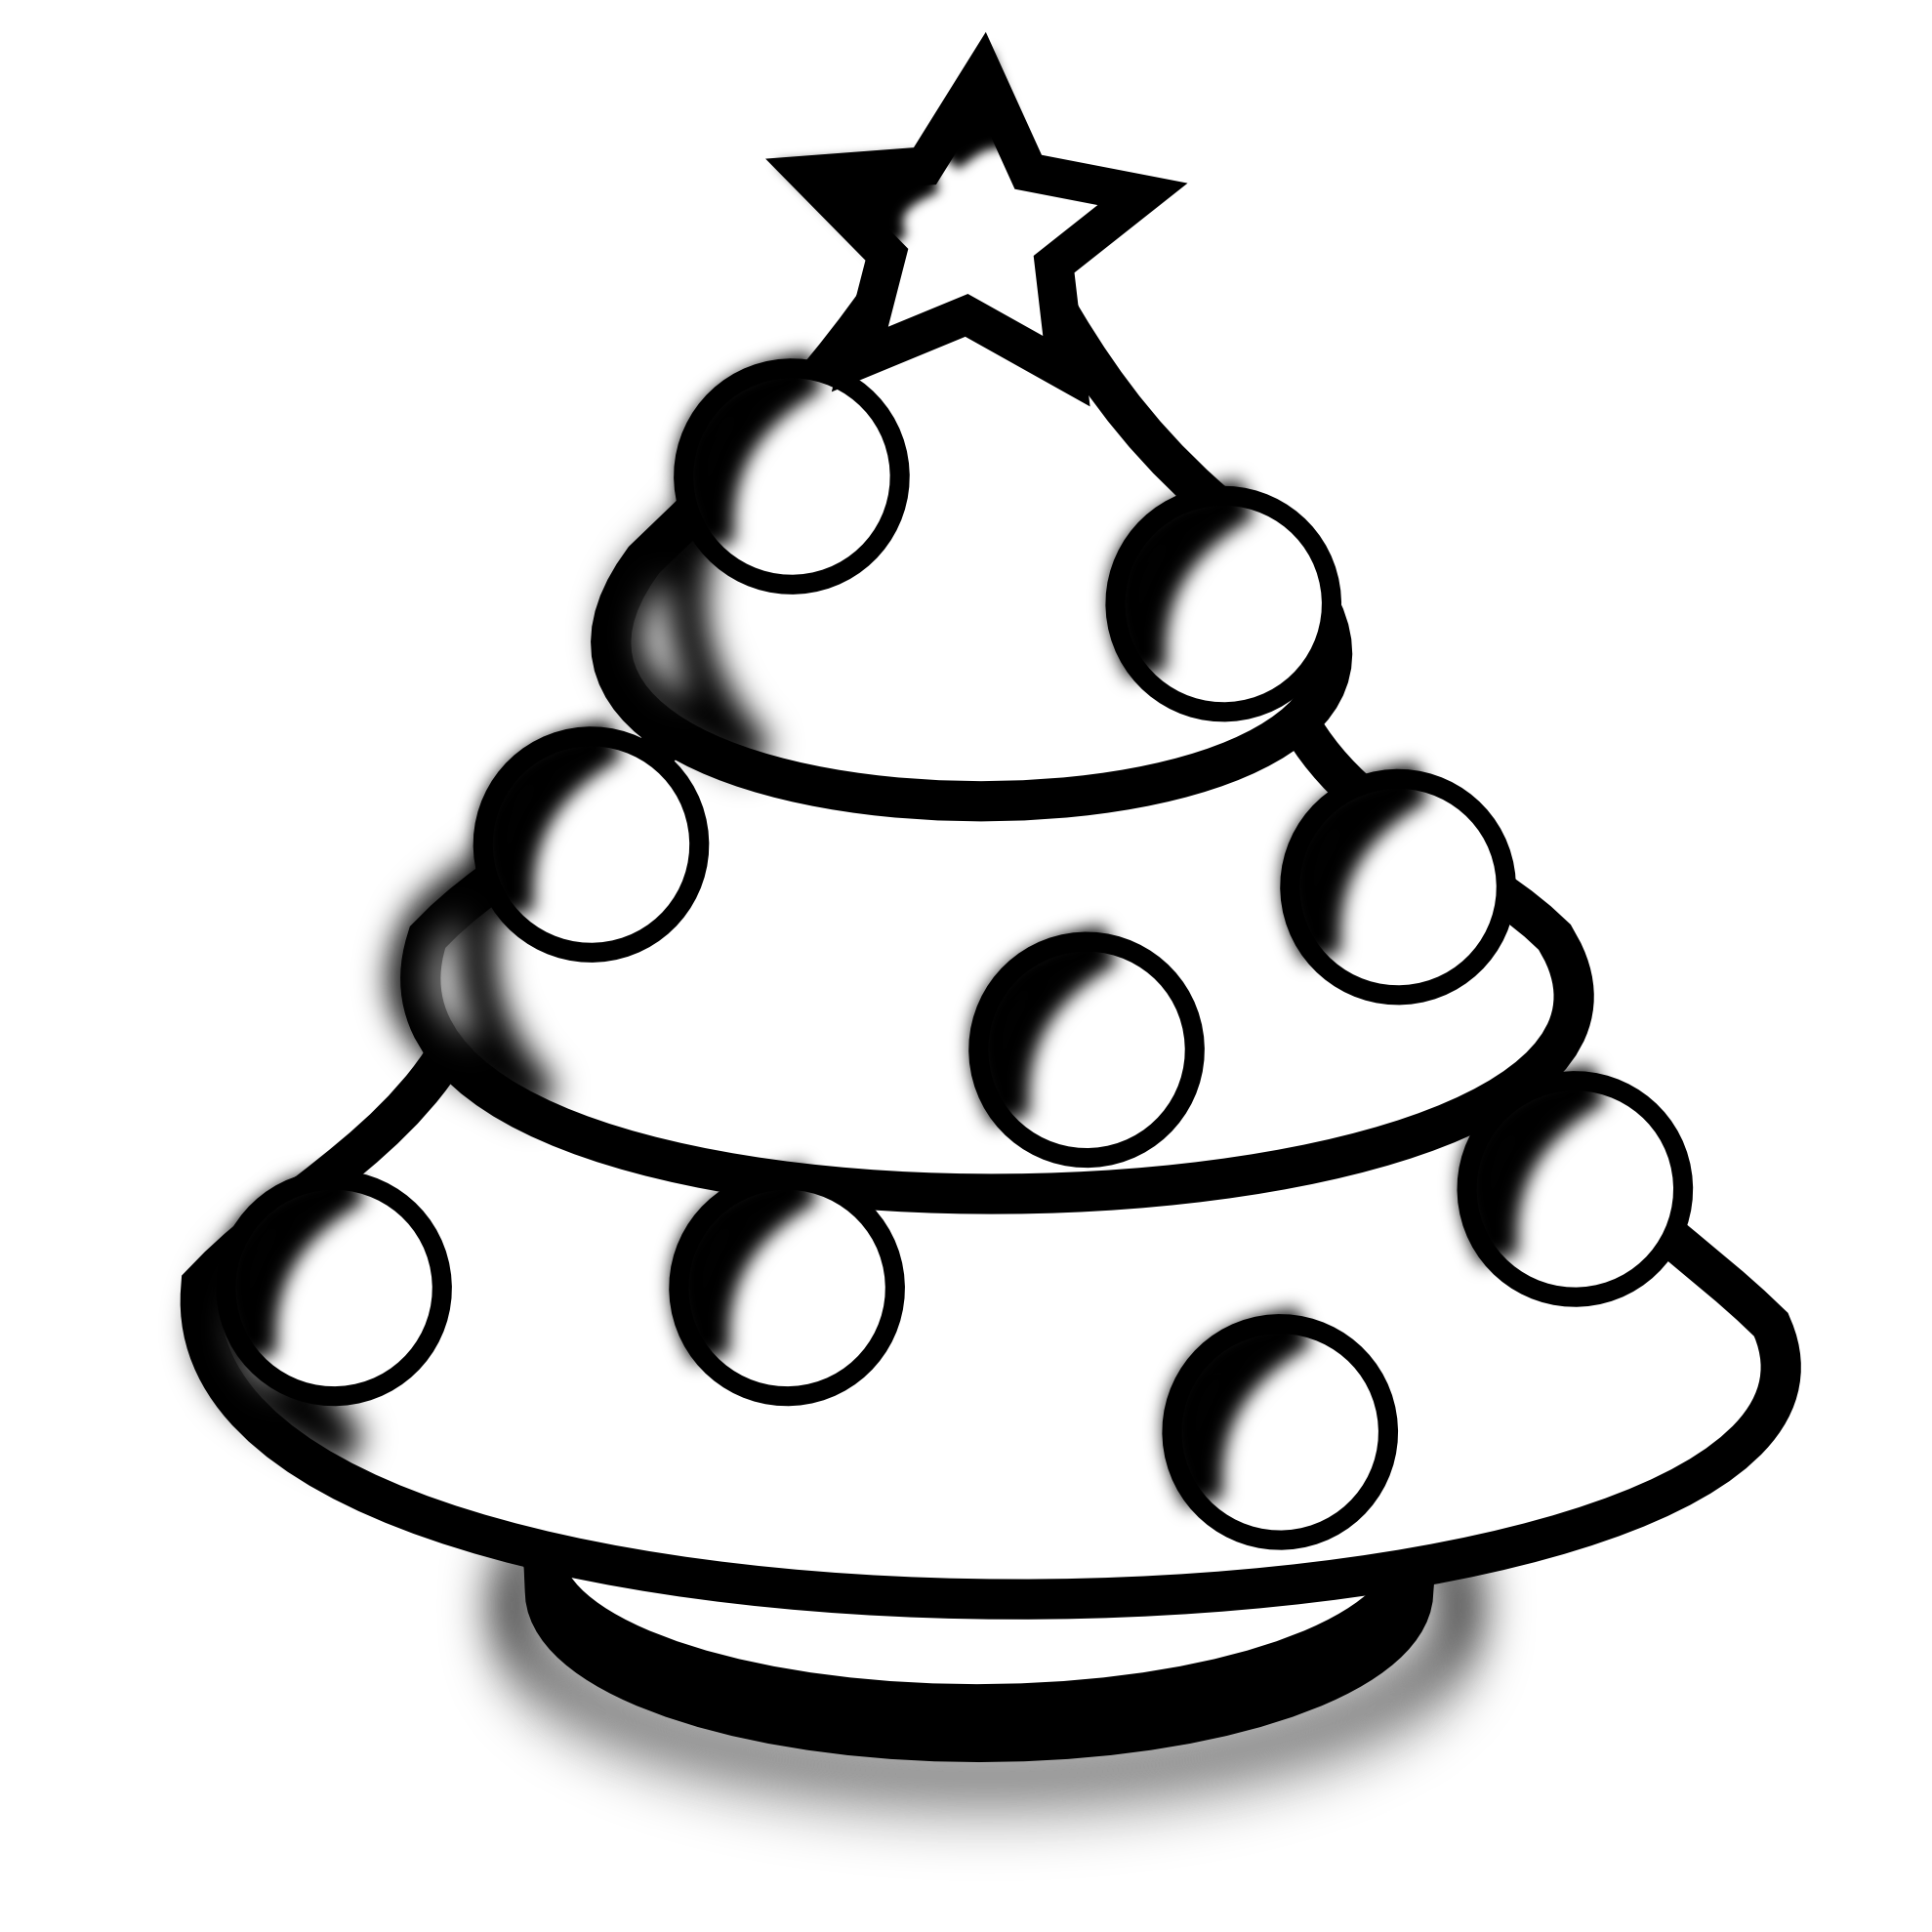 Snowflake clipart simple black clip freeuse library Christmas black and white black and white christmas clip art free 2 ... clip freeuse library